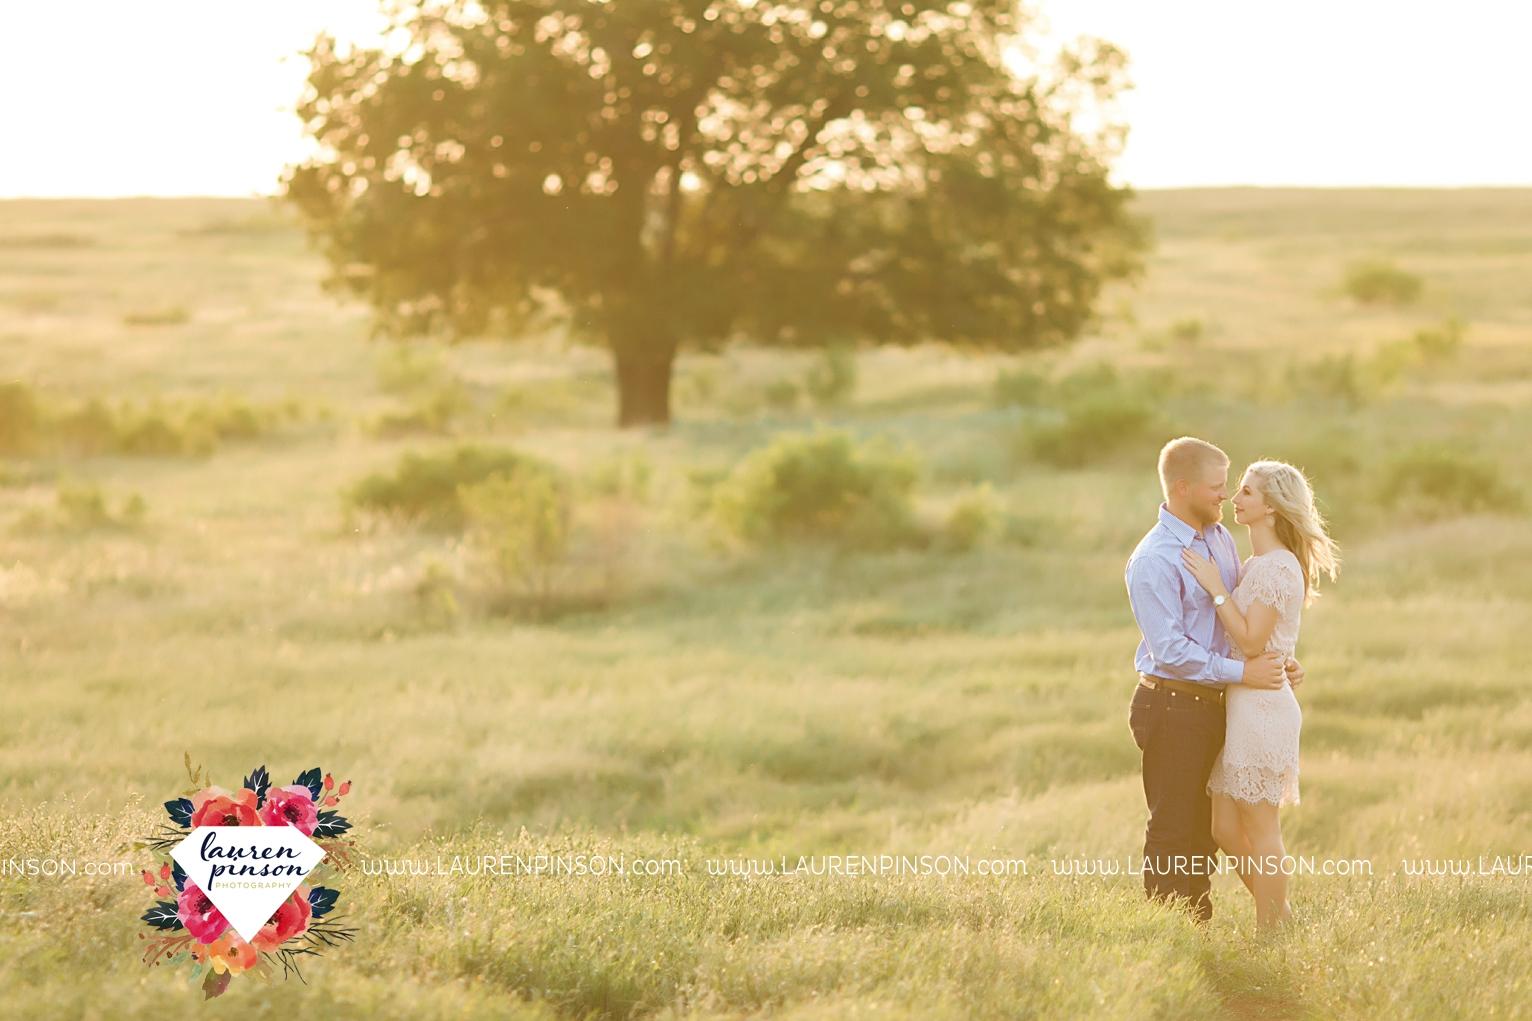 wichita-falls-texas-wedding-photographer-scotland-texas-engagement-session-country-barn-field-windthorst_2757.jpg